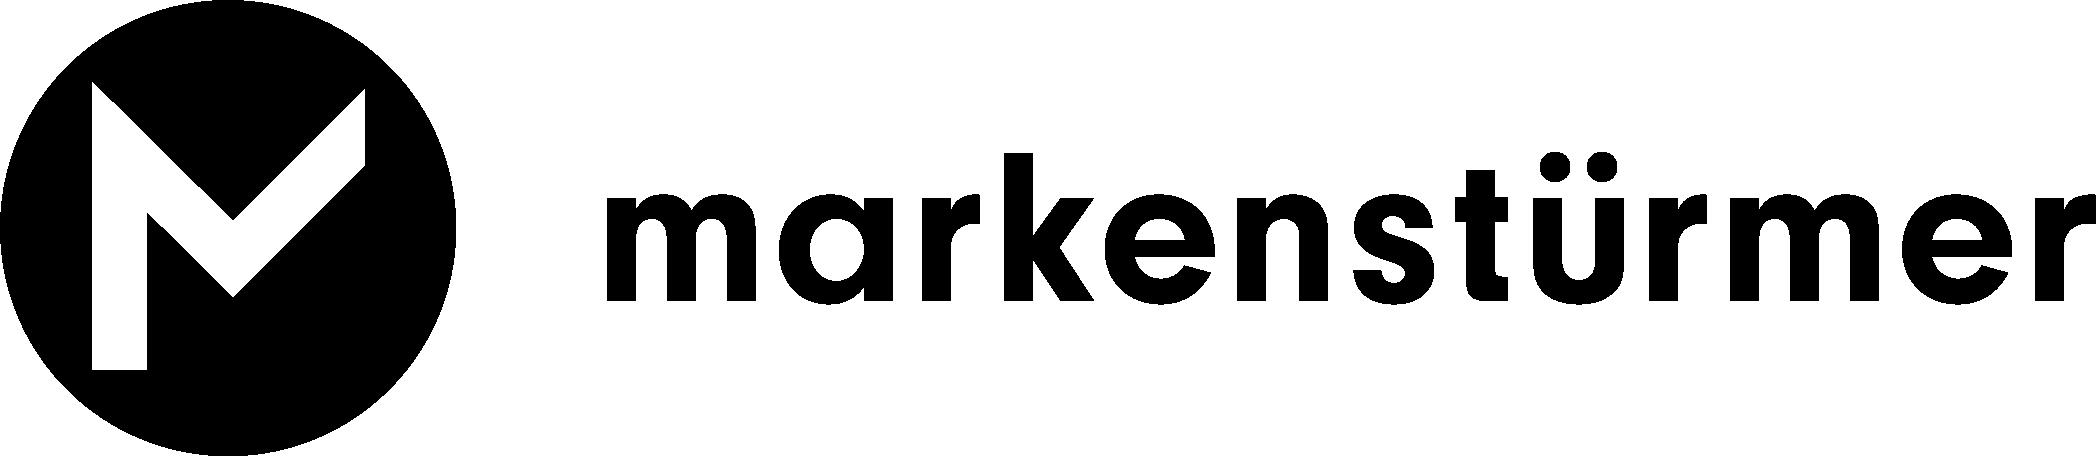 Teichmann Marketingservice GmbH